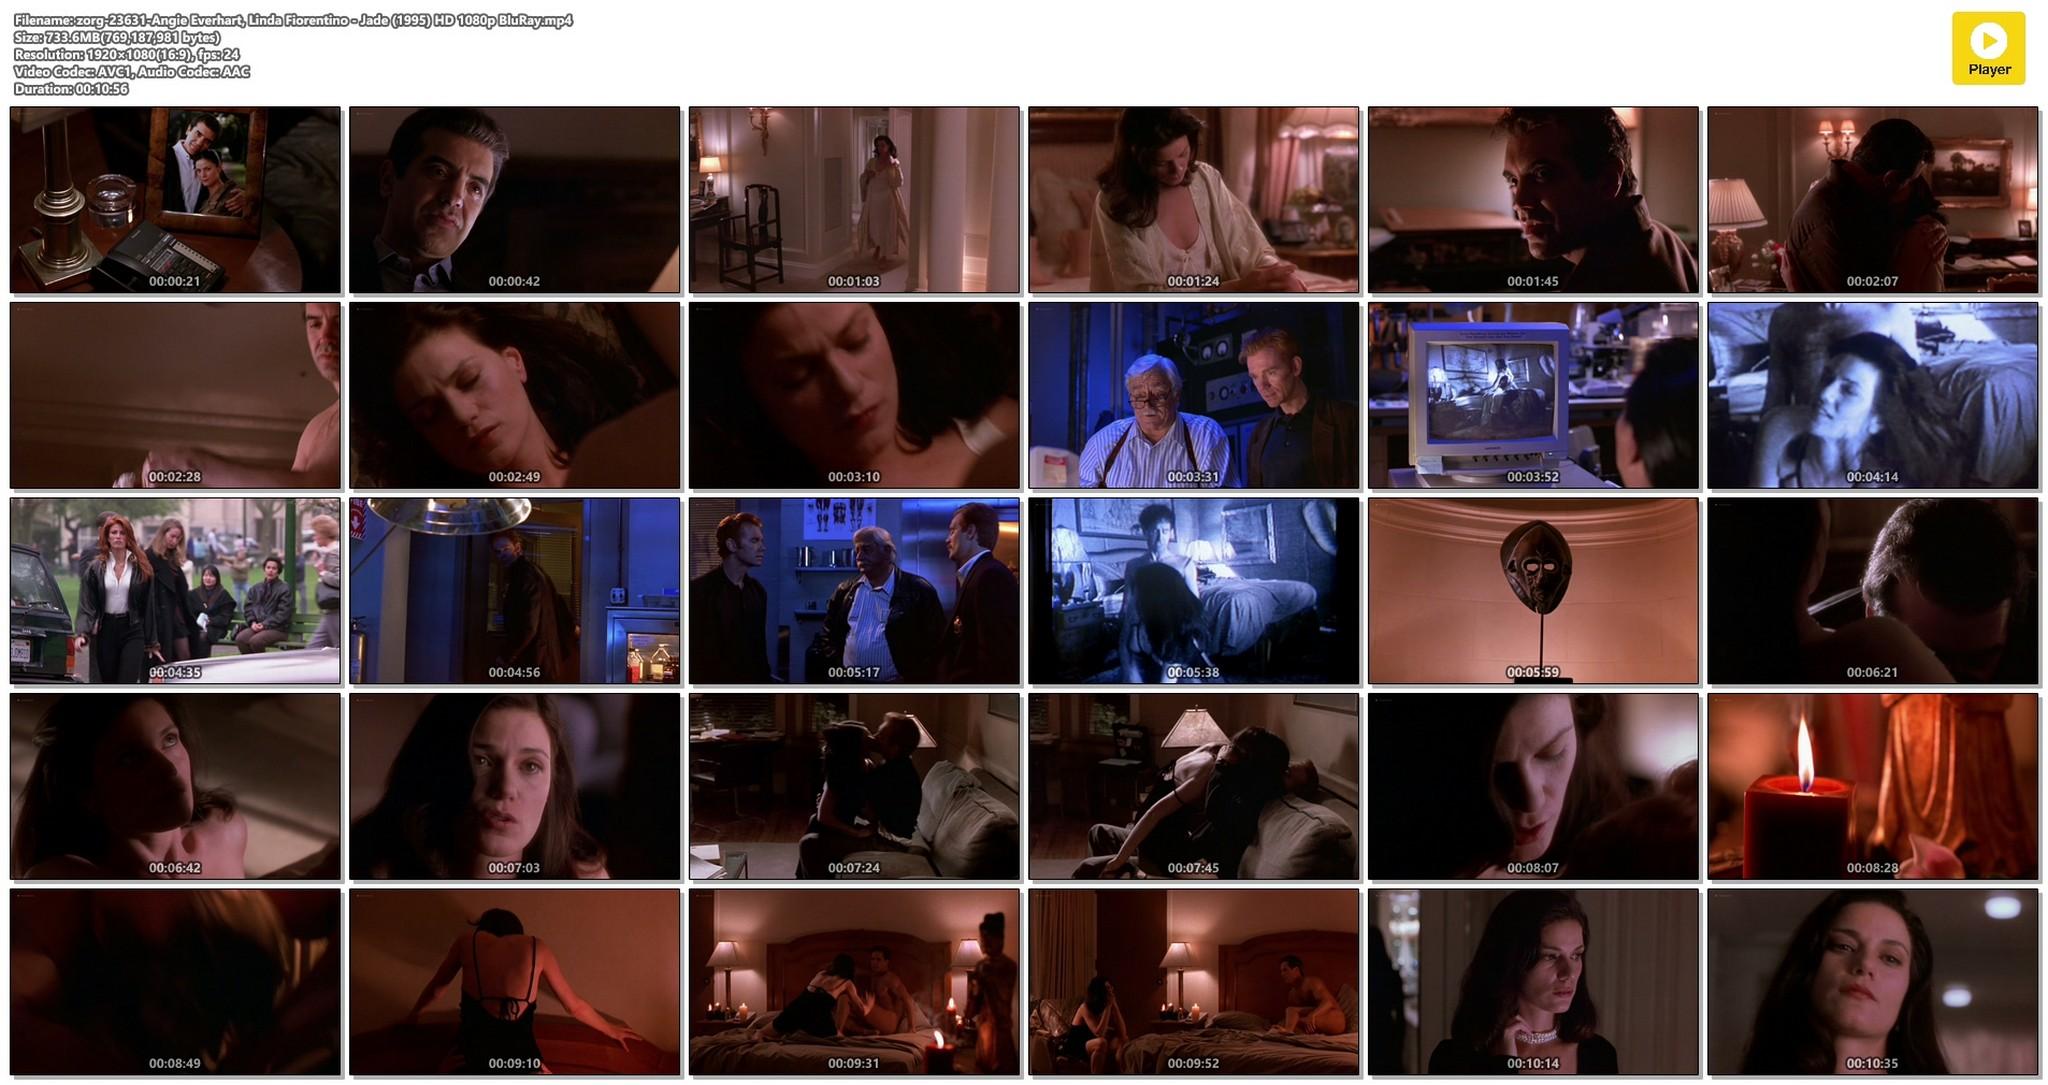 Linda Fiorentino nude Angie Everhart nude full frontal - Jade (1995) HD 1080p BluRay (1)